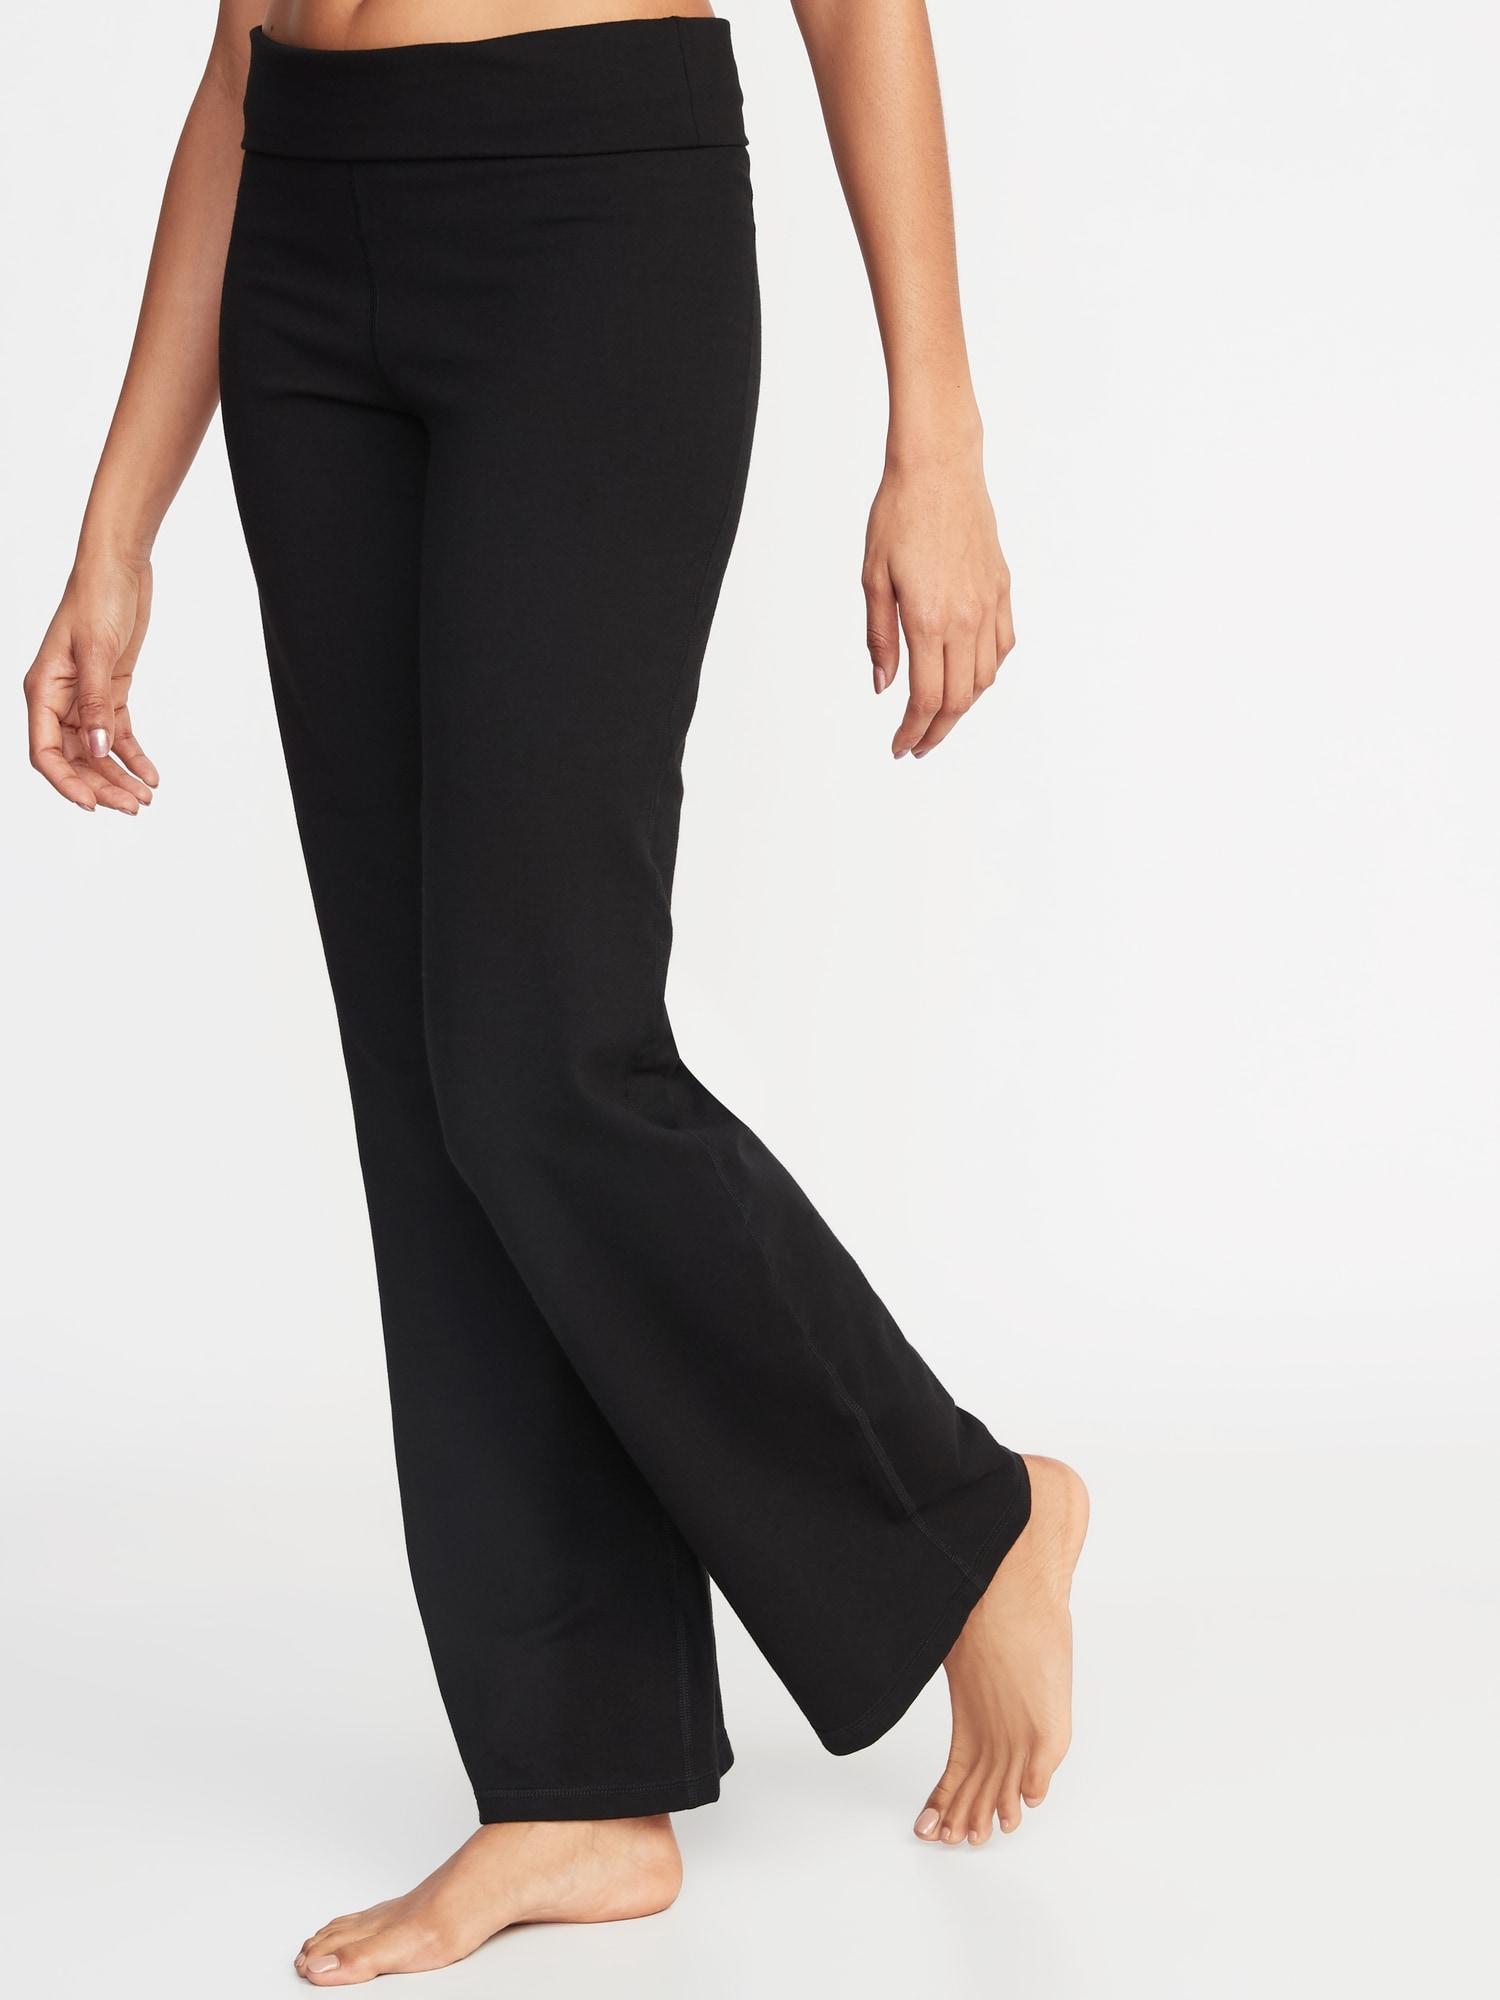 79fe57d7c261c Mid-Rise Wide-Leg Yoga Pants for Women   Old Navy